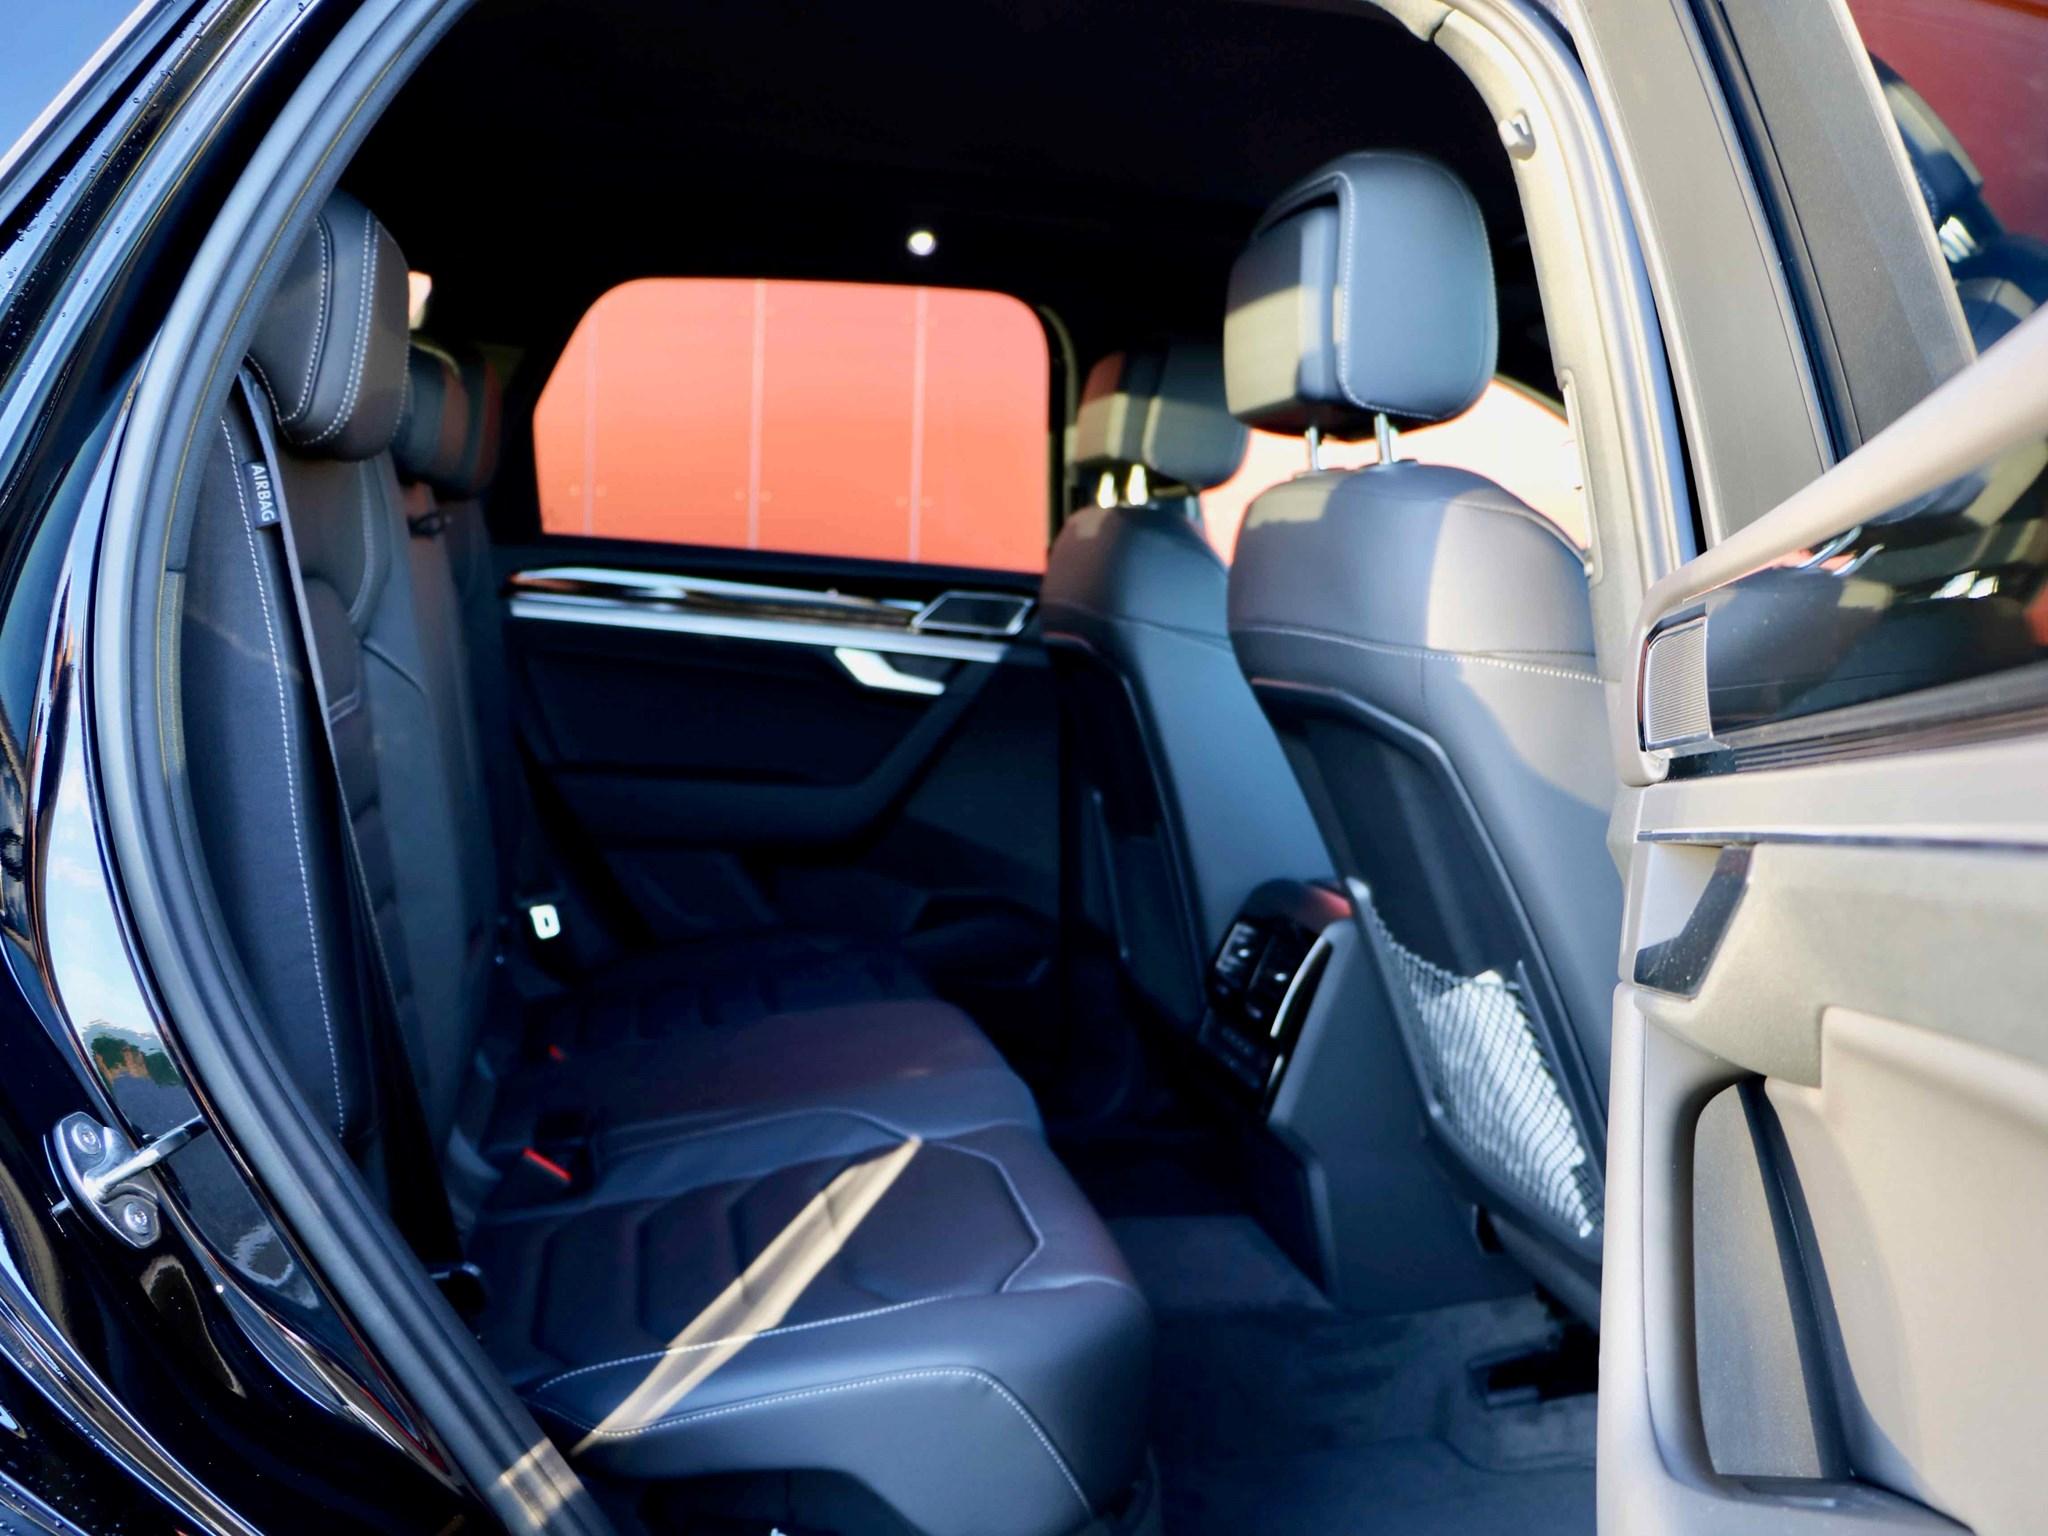 VW Touareg 3.0 TDI voll